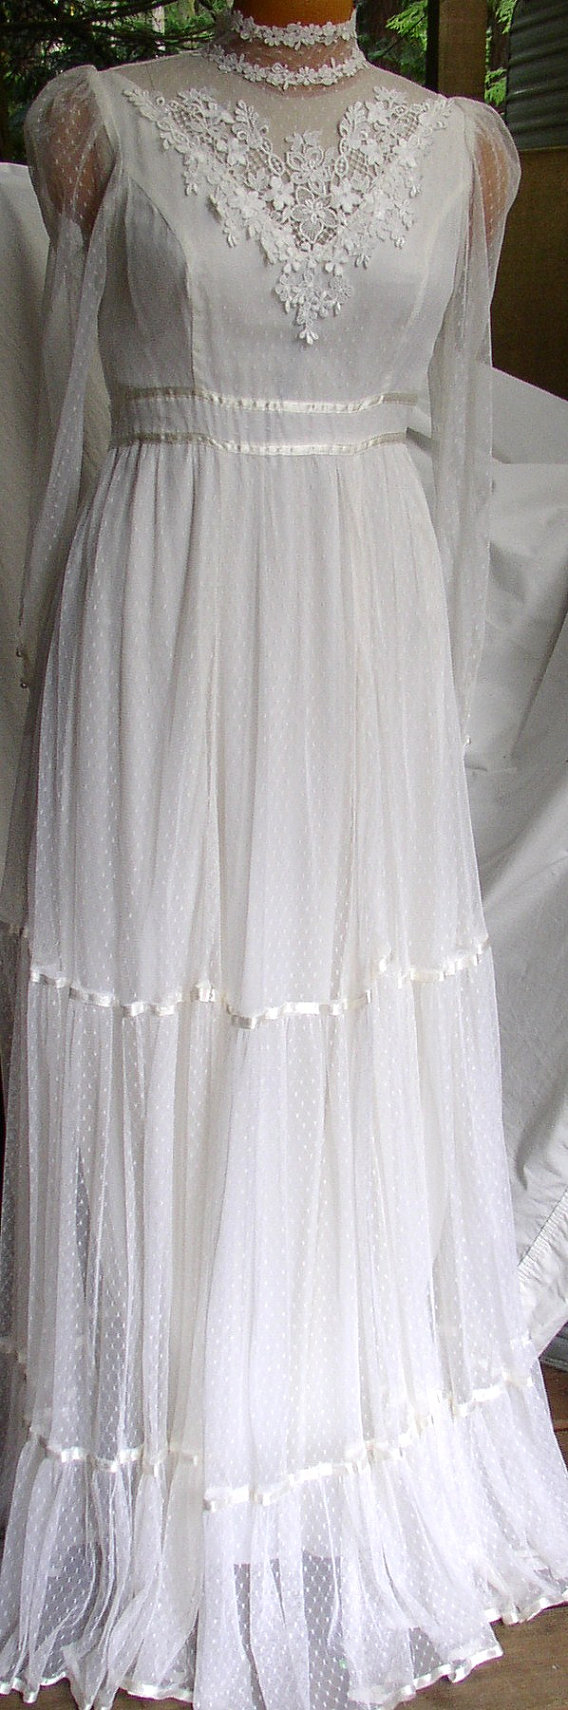 New pricewas gunnesax bridal dress white gown s